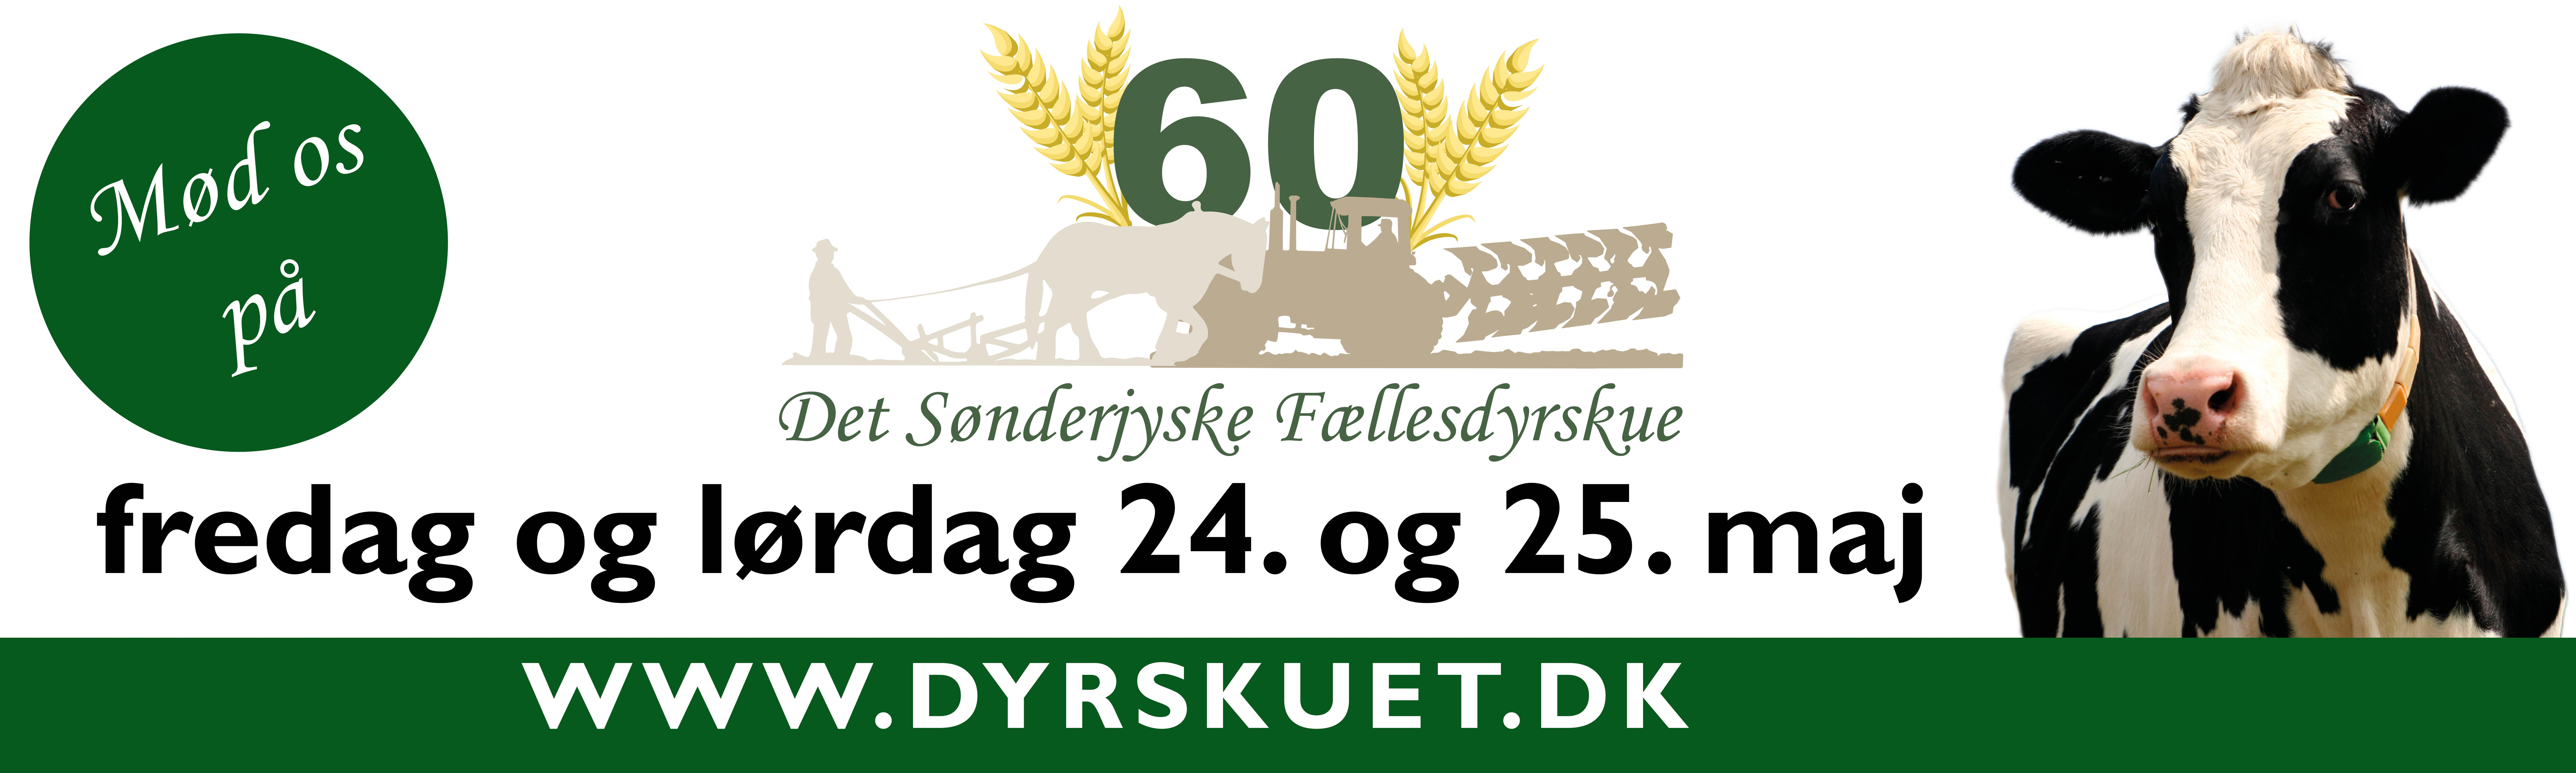 web banner2019